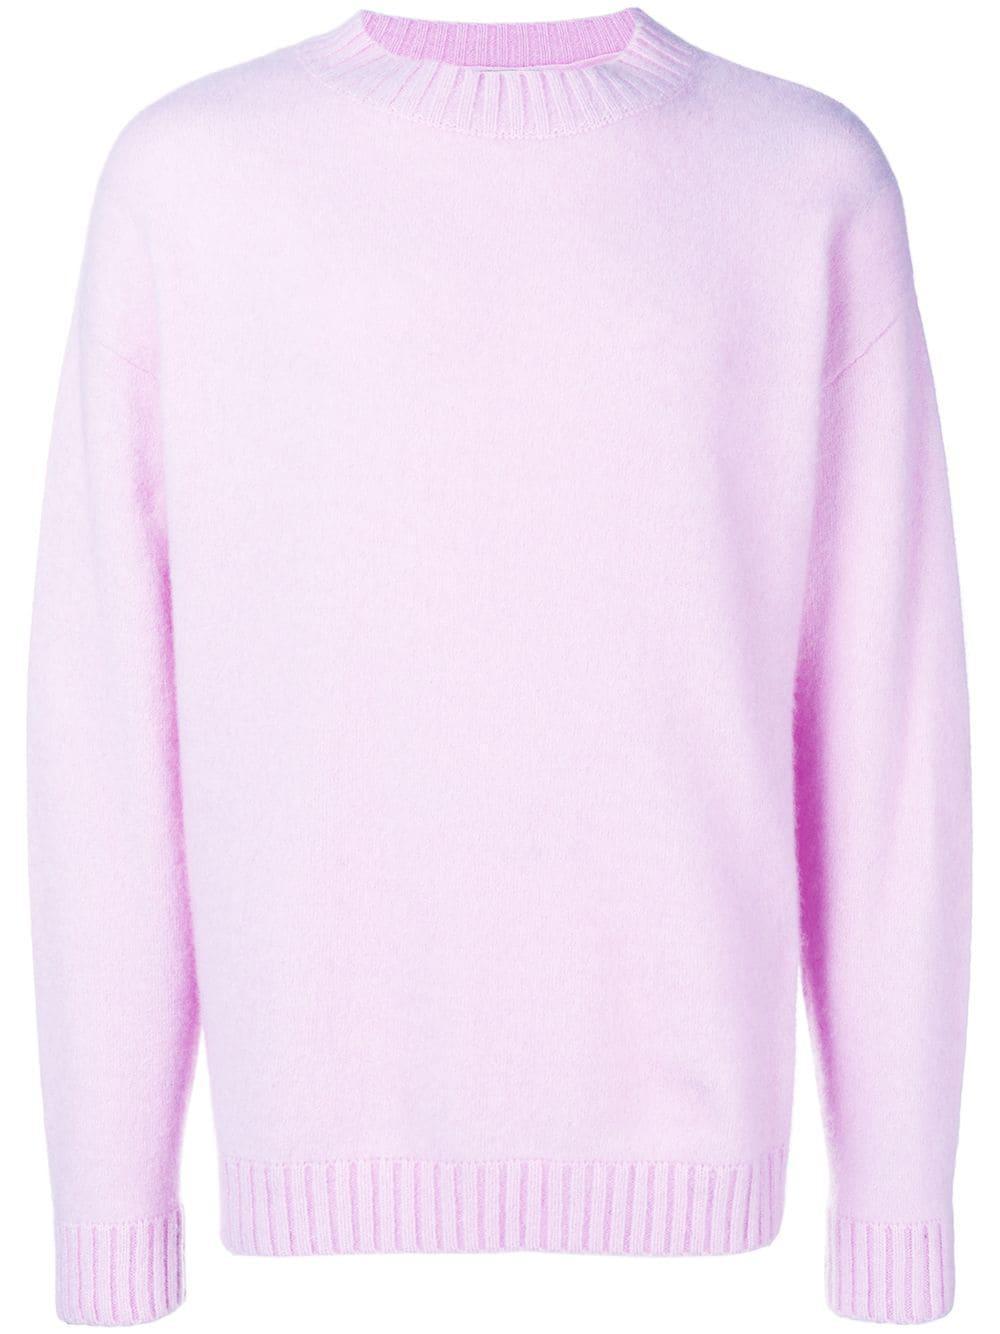 Laneus Crew Knitted Jumper - Pink